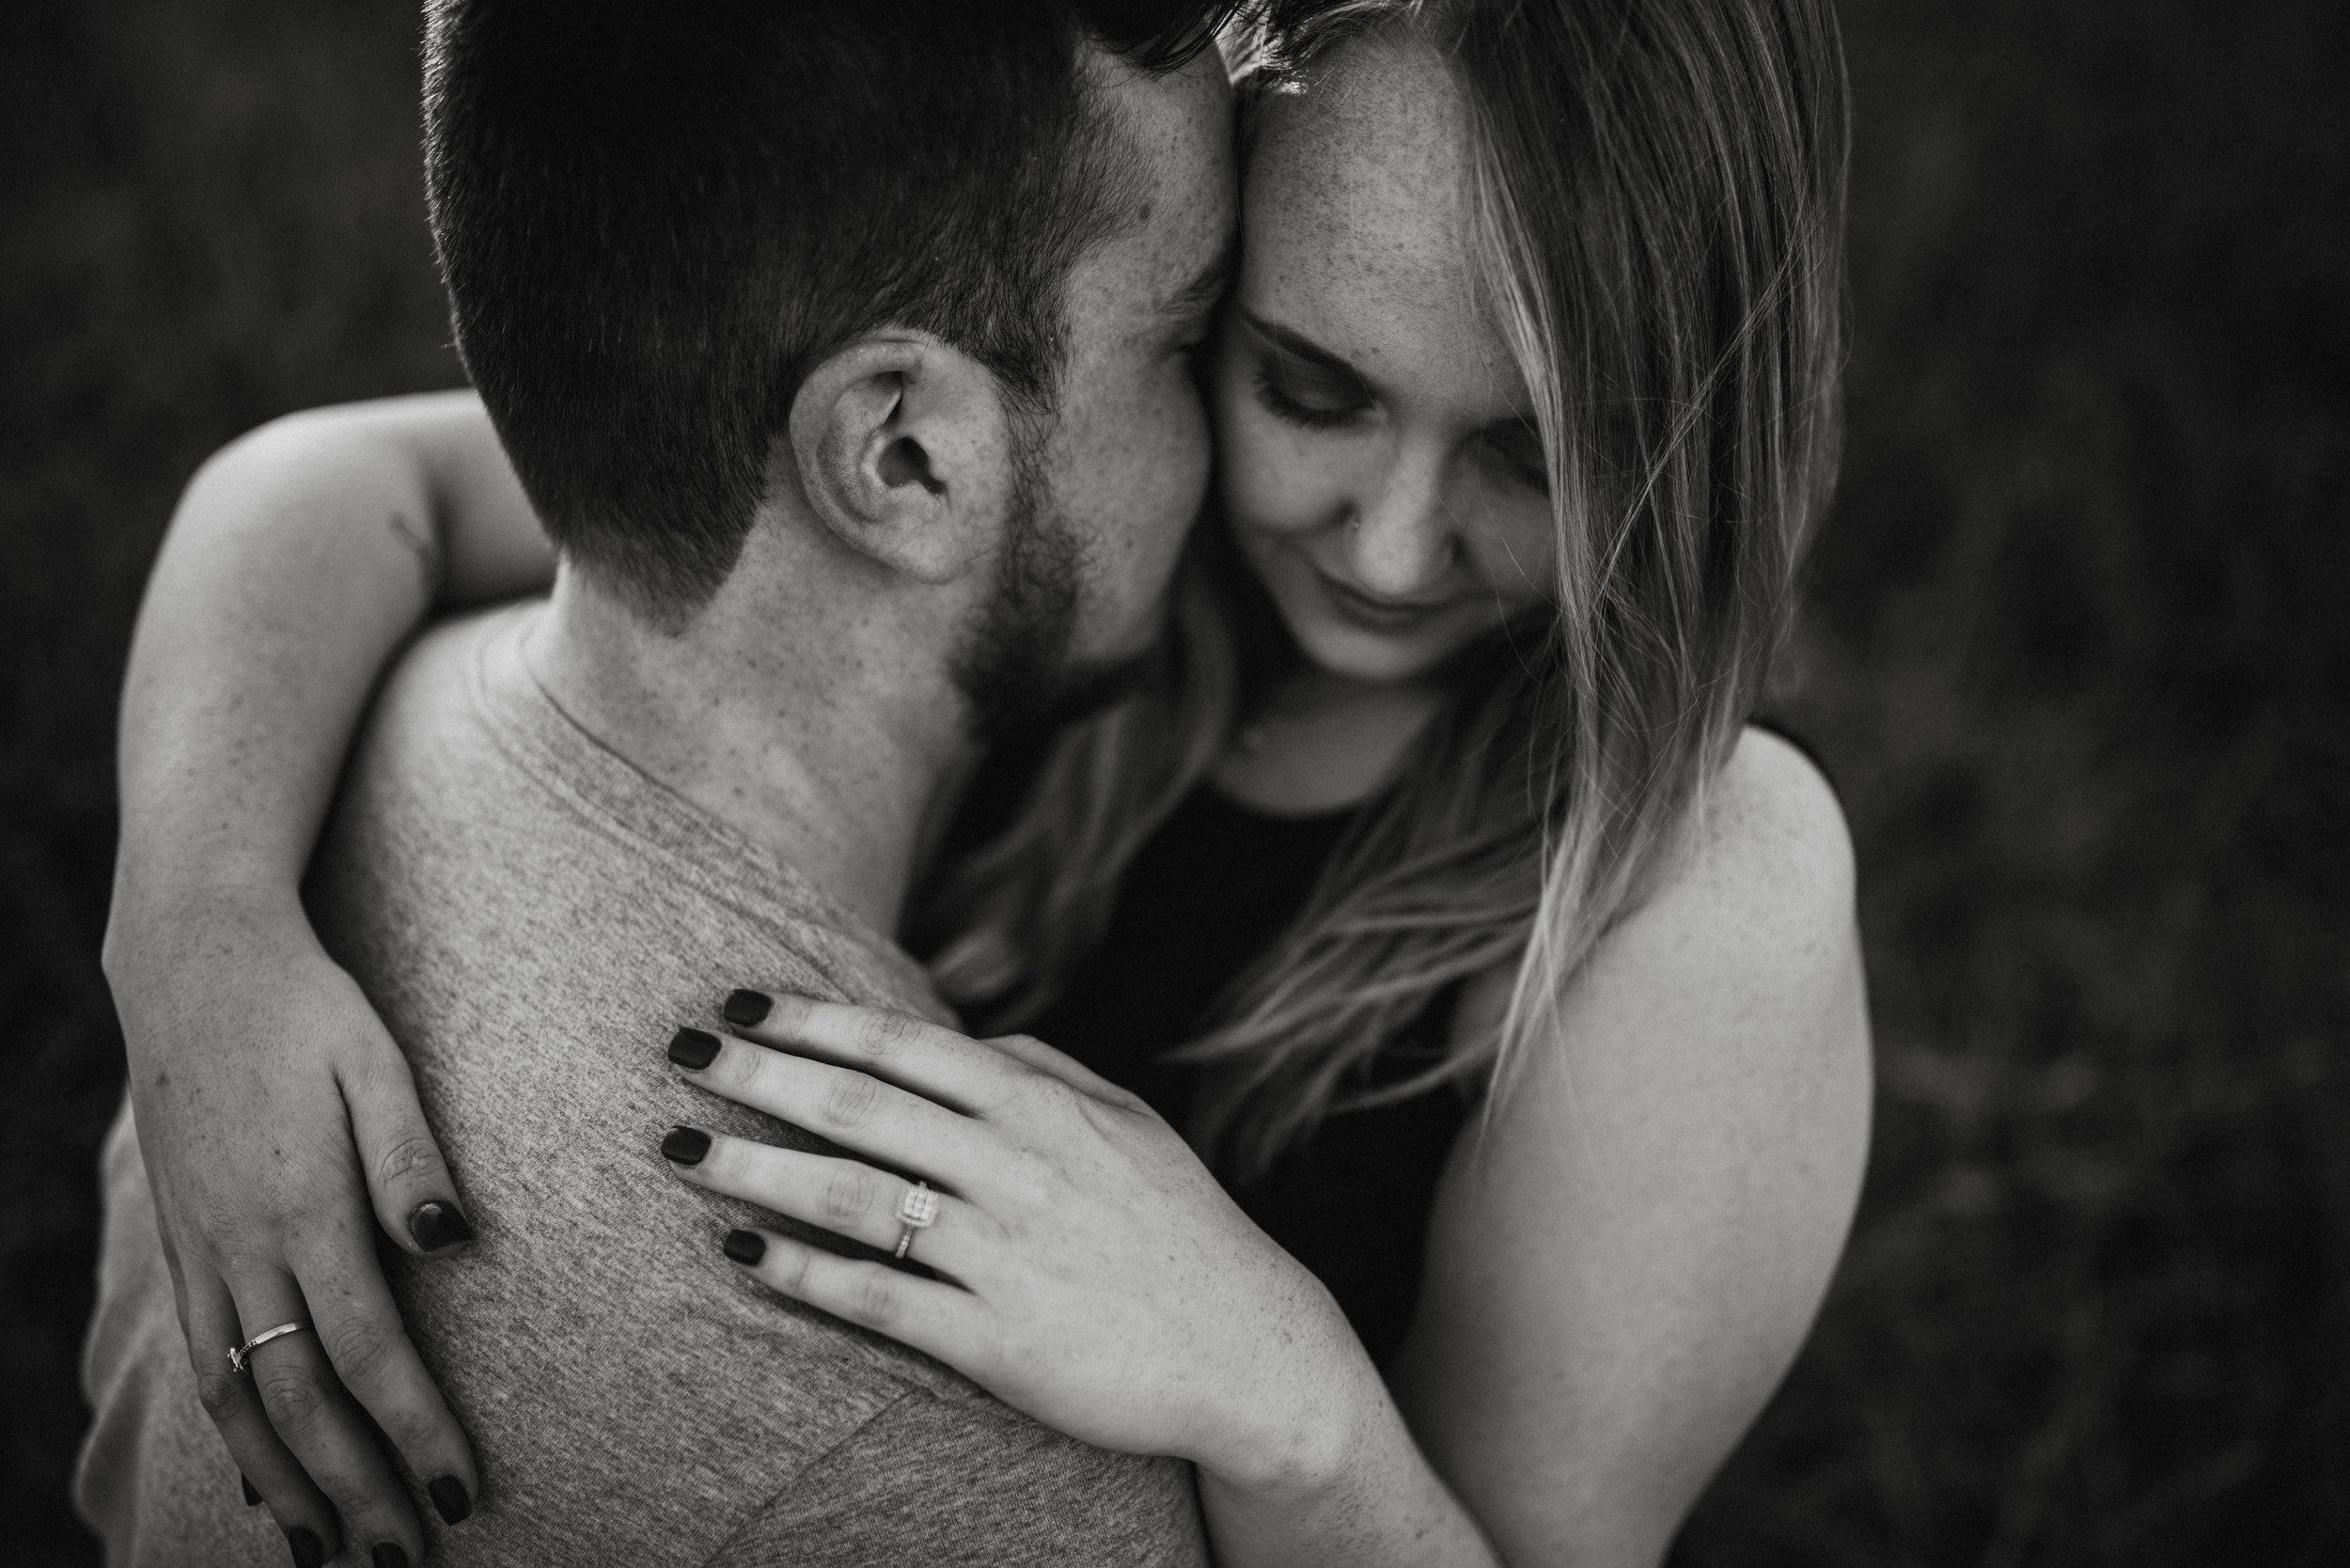 Lauren & Jack - Gerringong Engagement      2nd September 2017